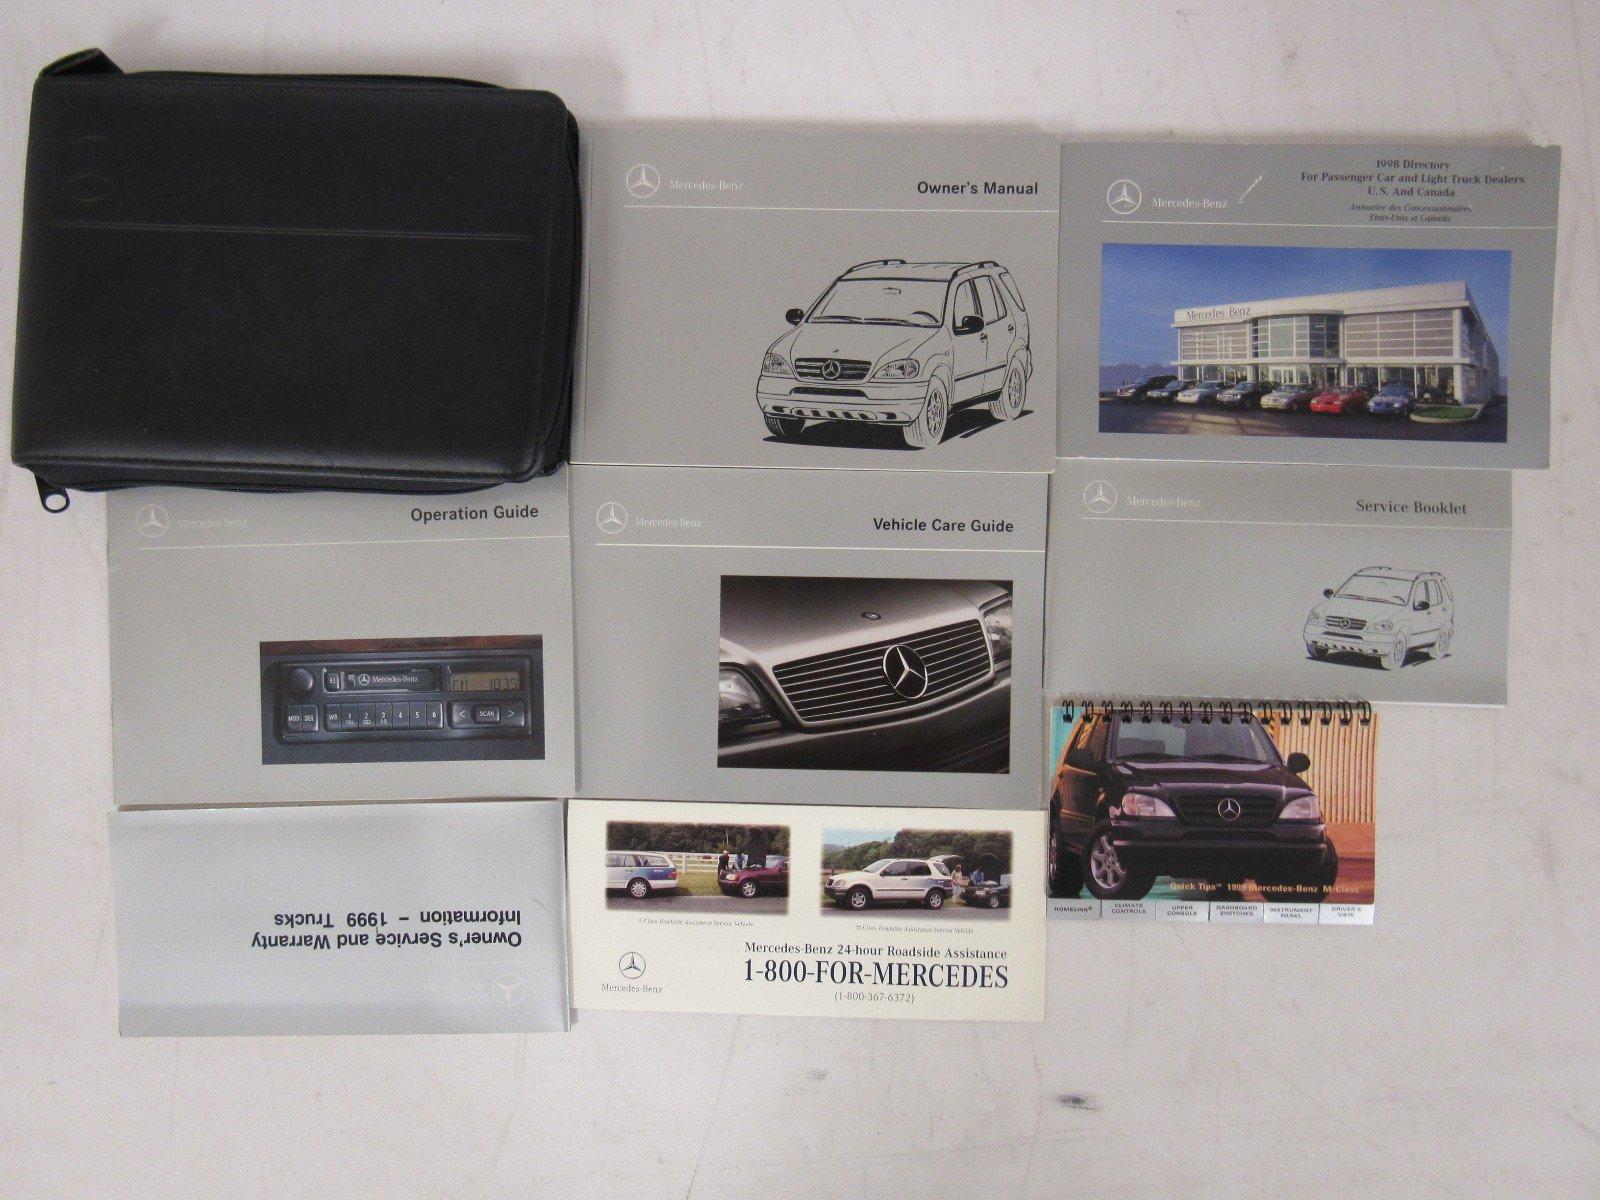 1999 Mercedes-Benz Light Truck ML 320 / 430 Owners Manual Guide Book:  Mercedes-Benz: Amazon.com: Books